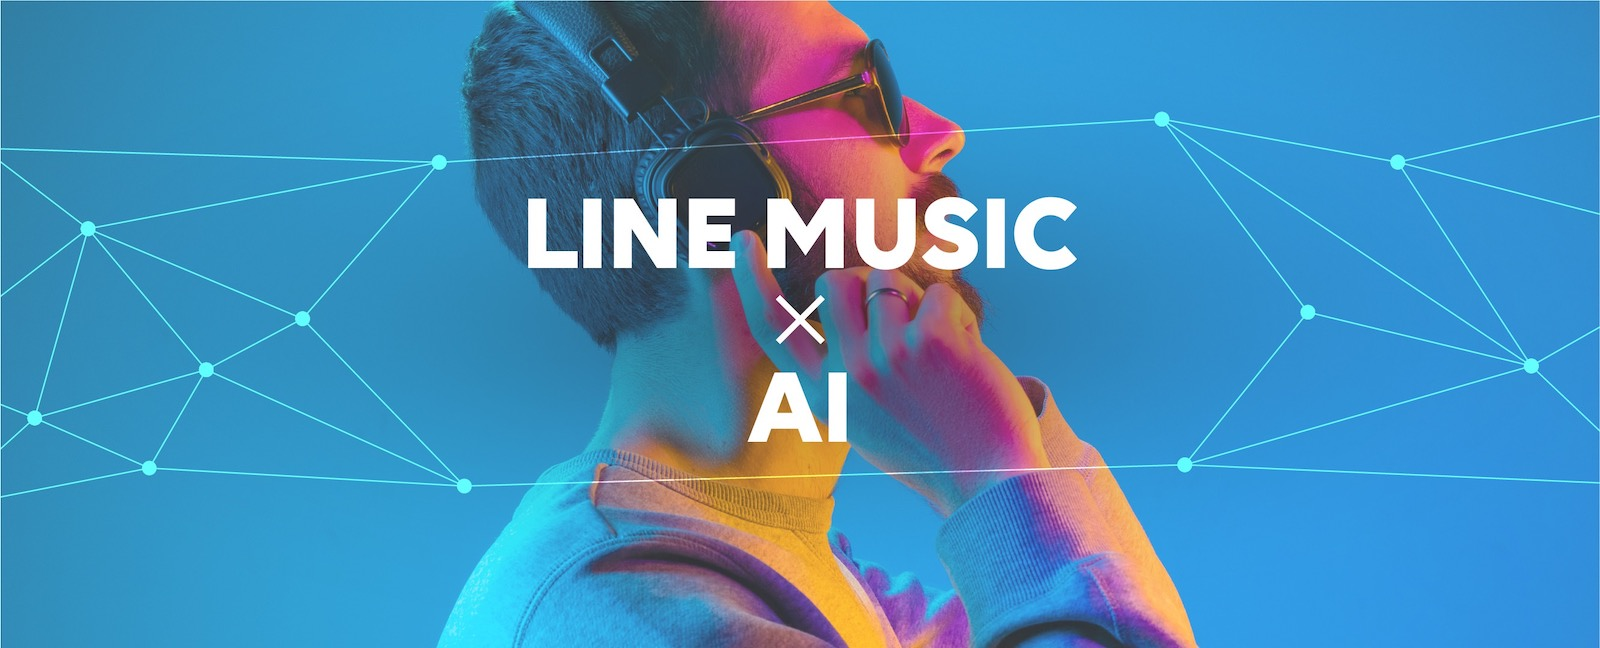 LINE MUSIC and AI